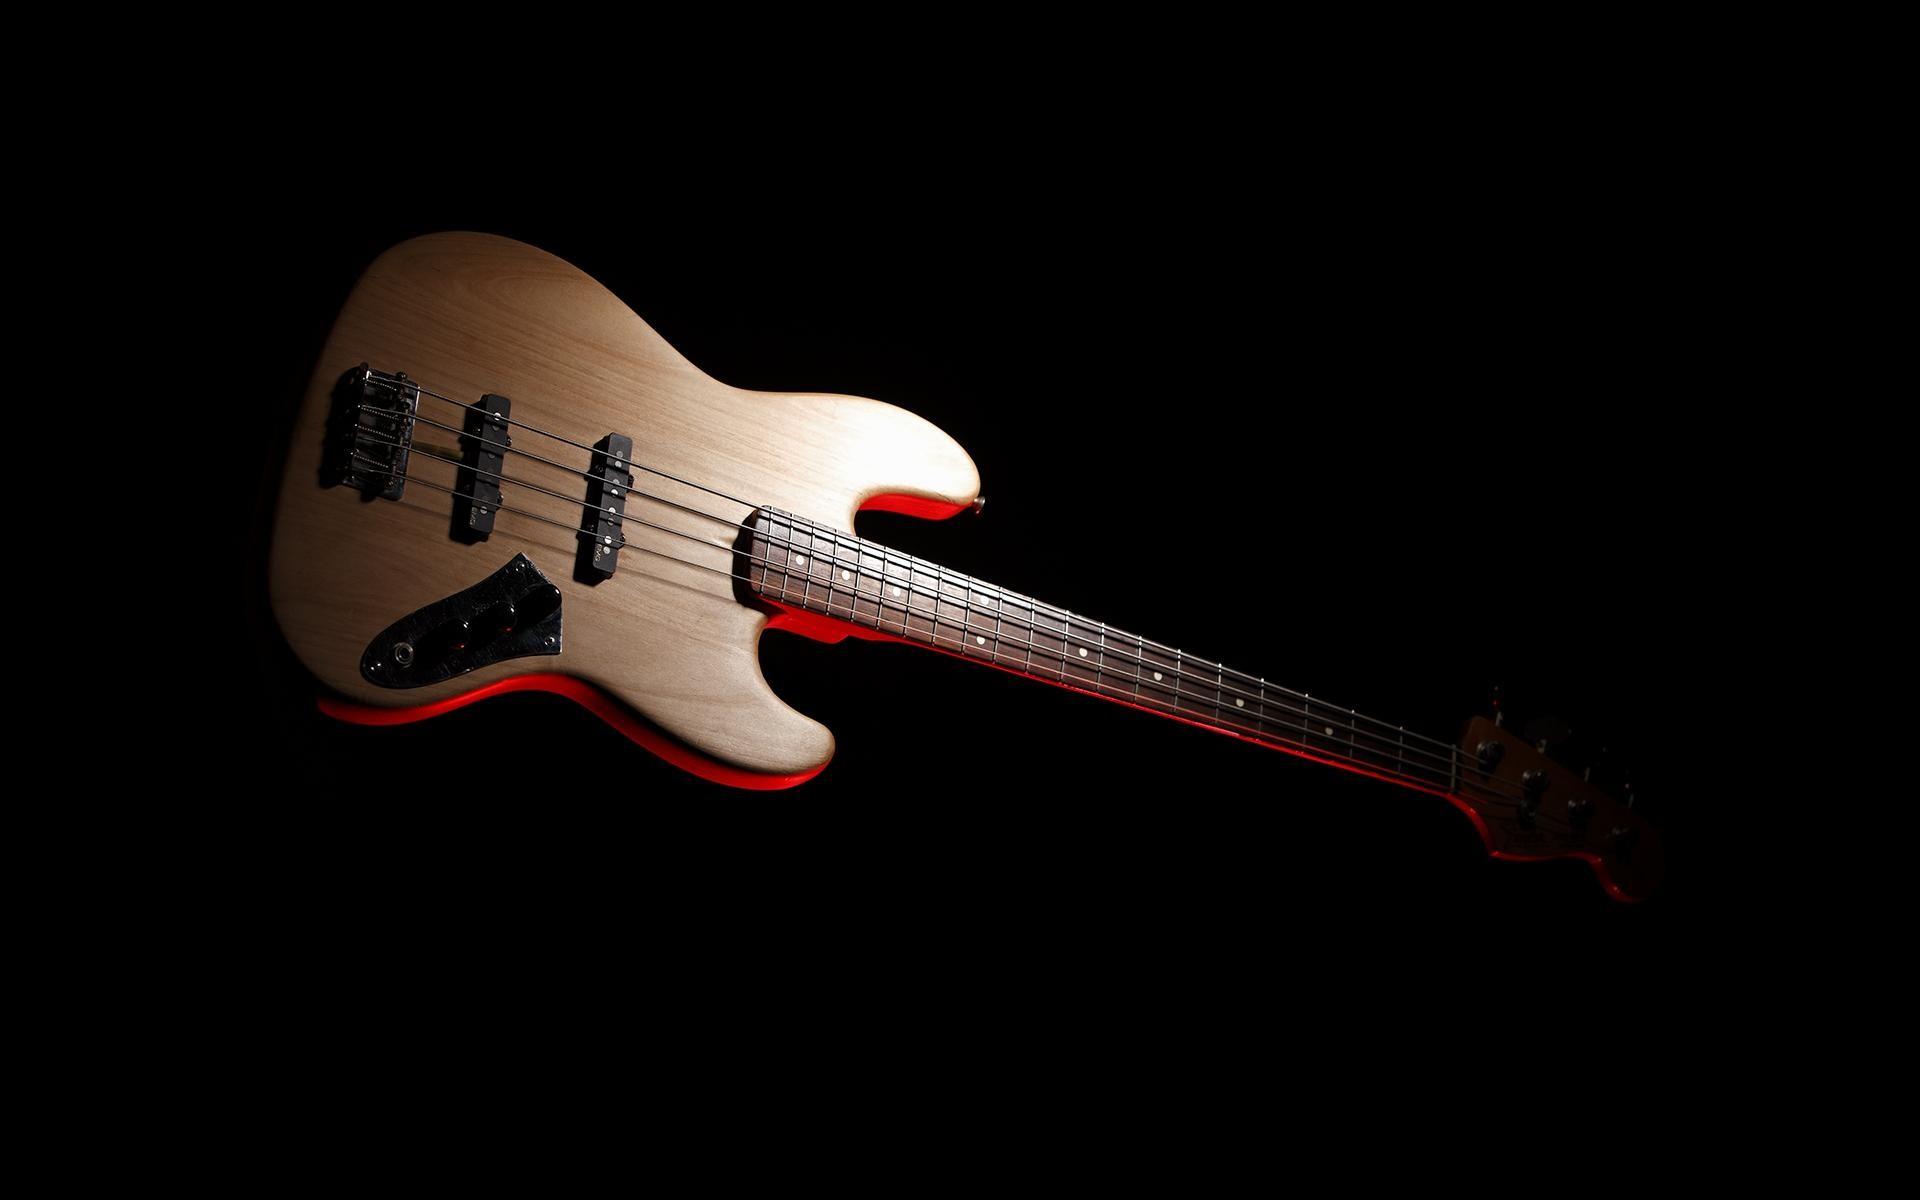 wallpaper.wiki-Bass-Guitar-Background-Widescreen-PIC-WPC001495